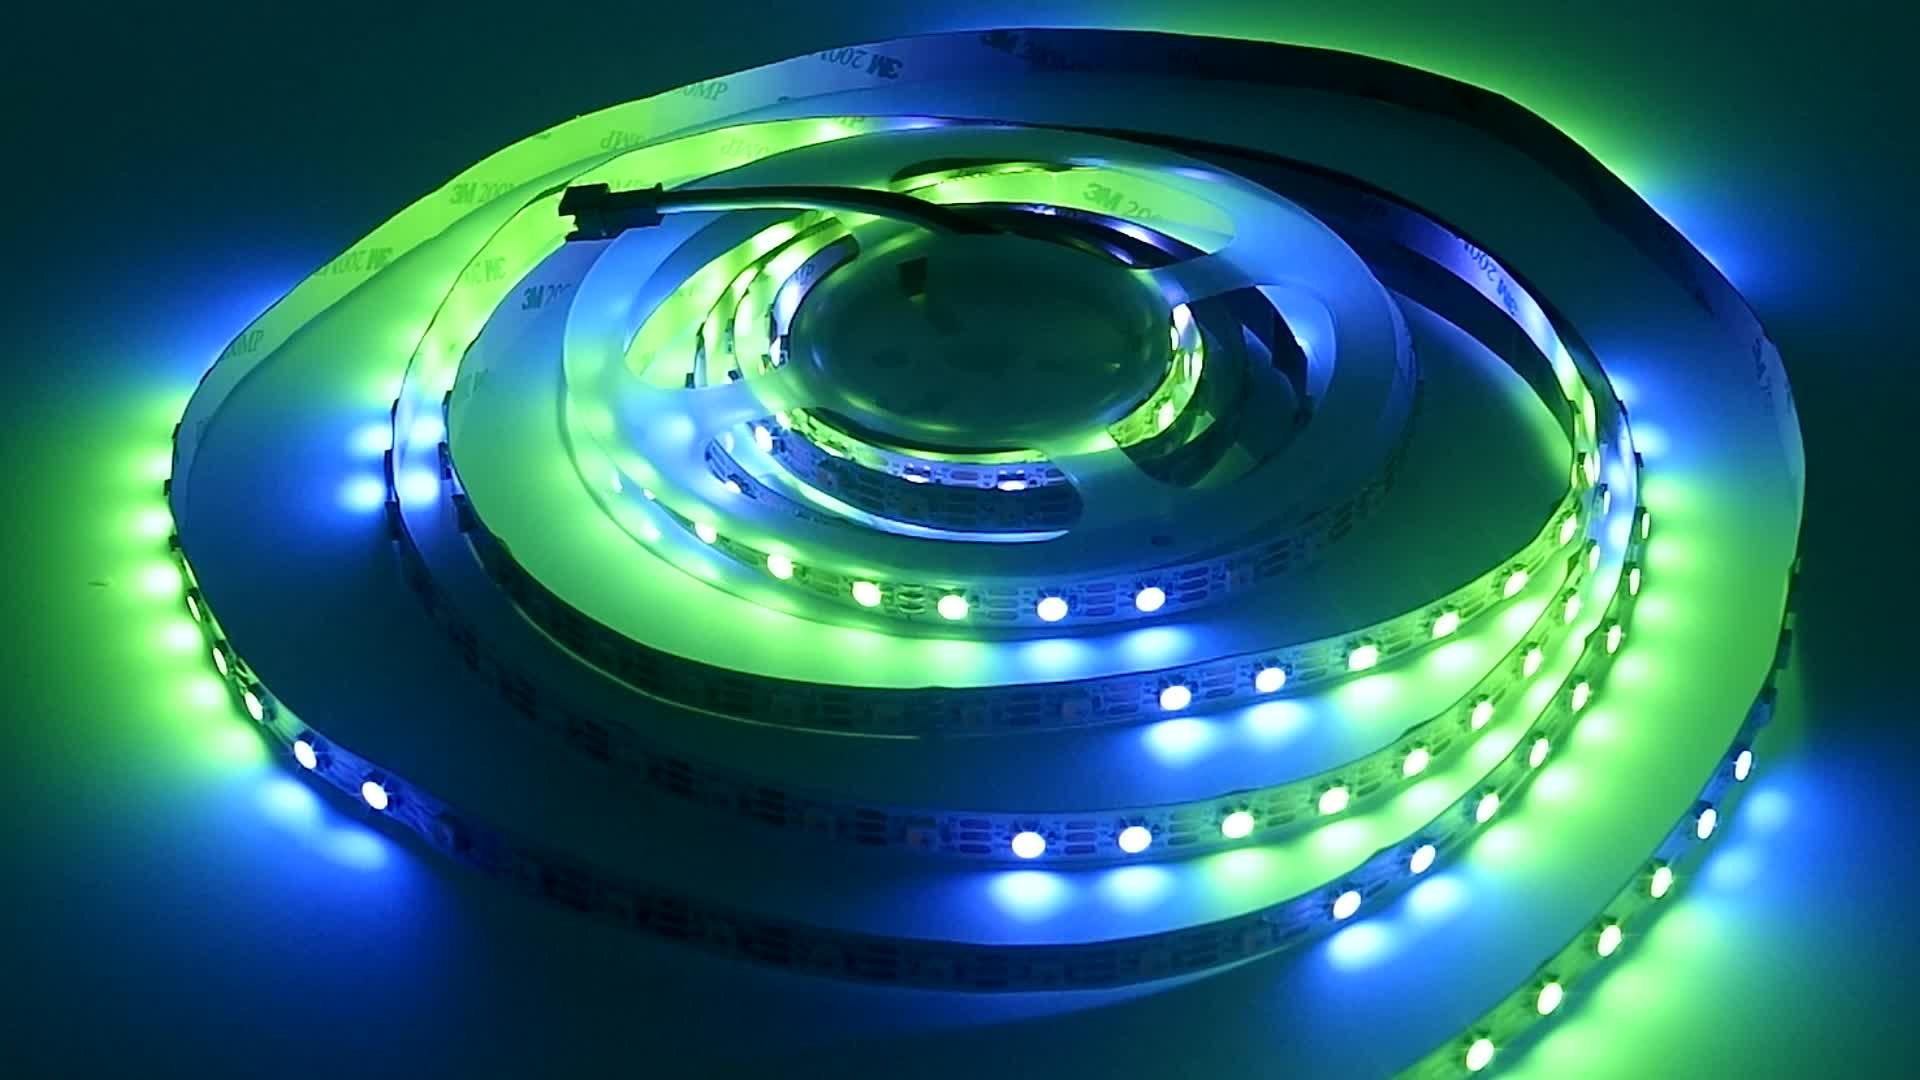 RGB Magic color DC5V addressable ws2812 30 pixels sk6812 led strip light RGB Full color ws2812b